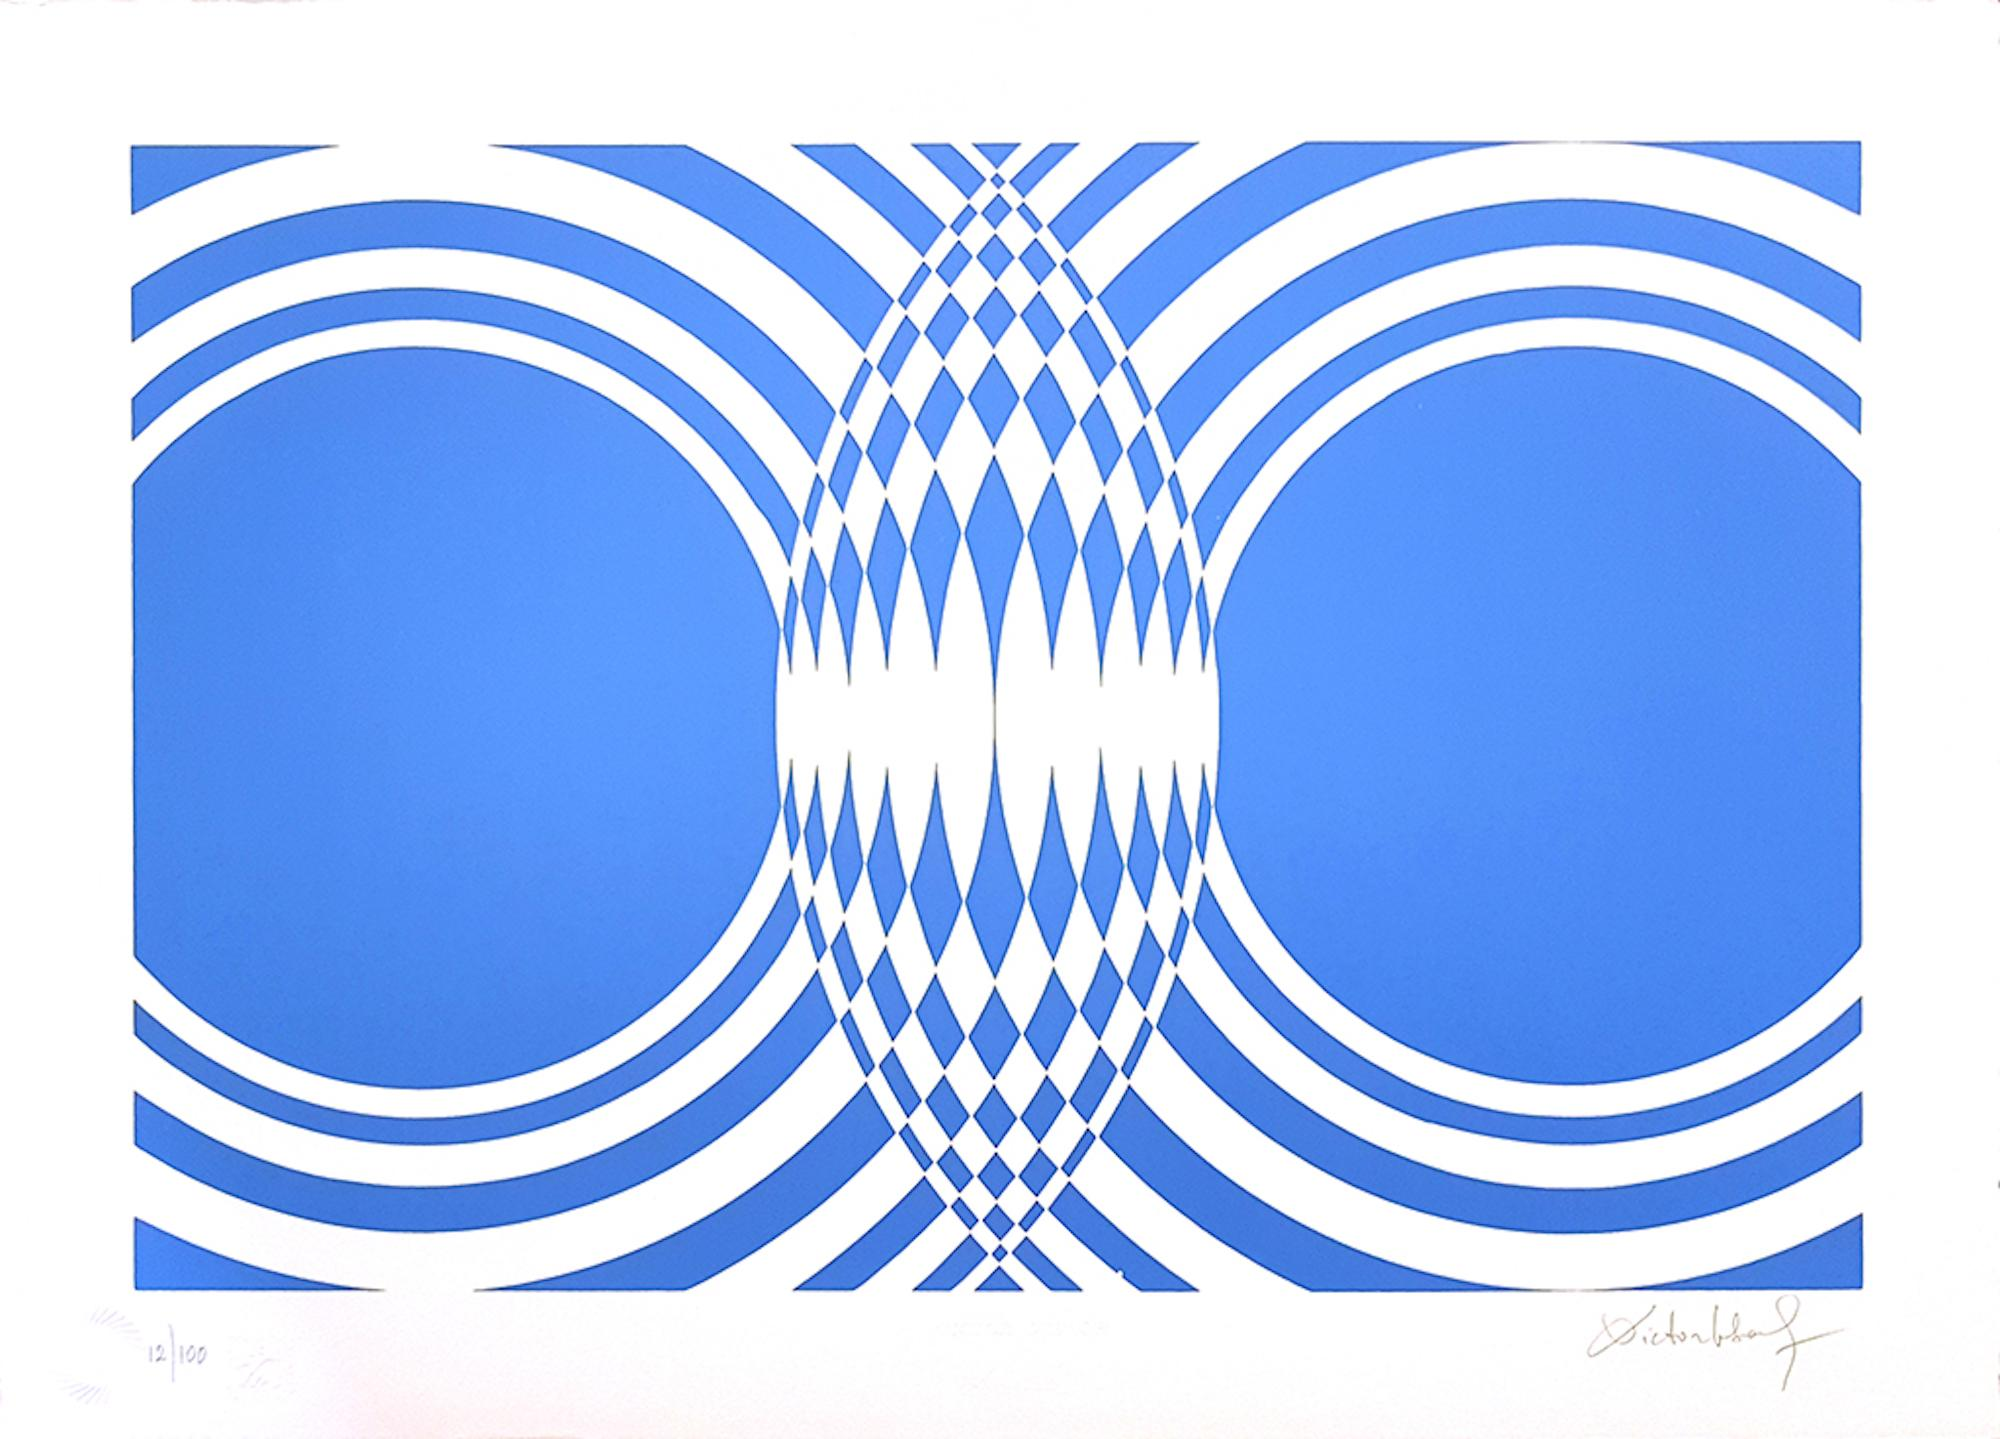 Blue Composition - Original Screen Print by V. Debach - 1970s